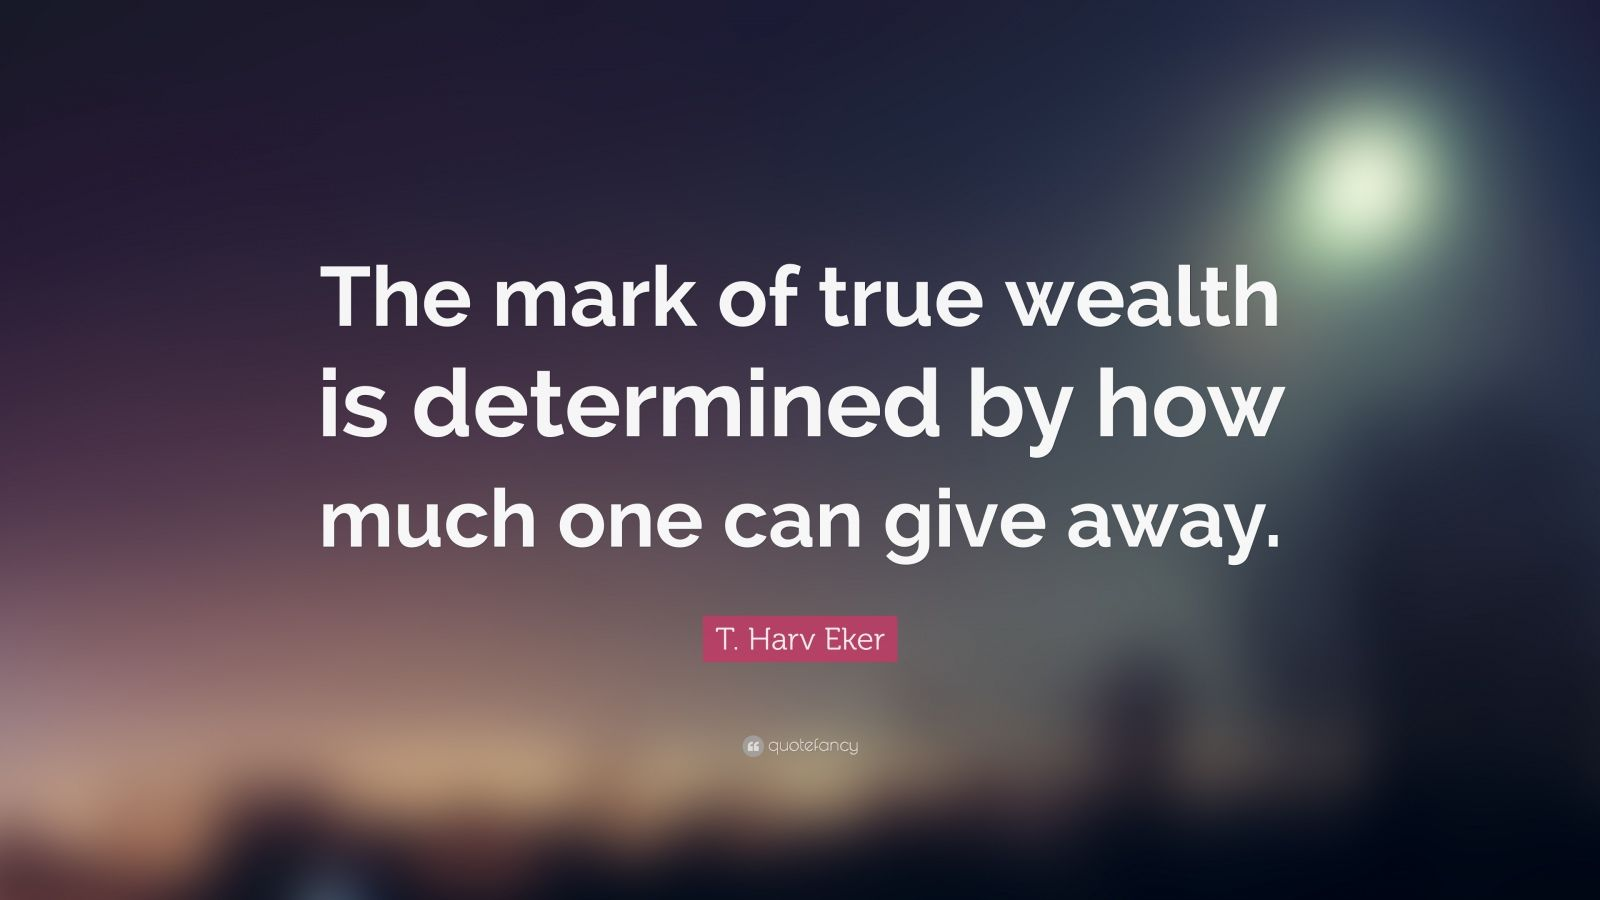 t harv eker net worth